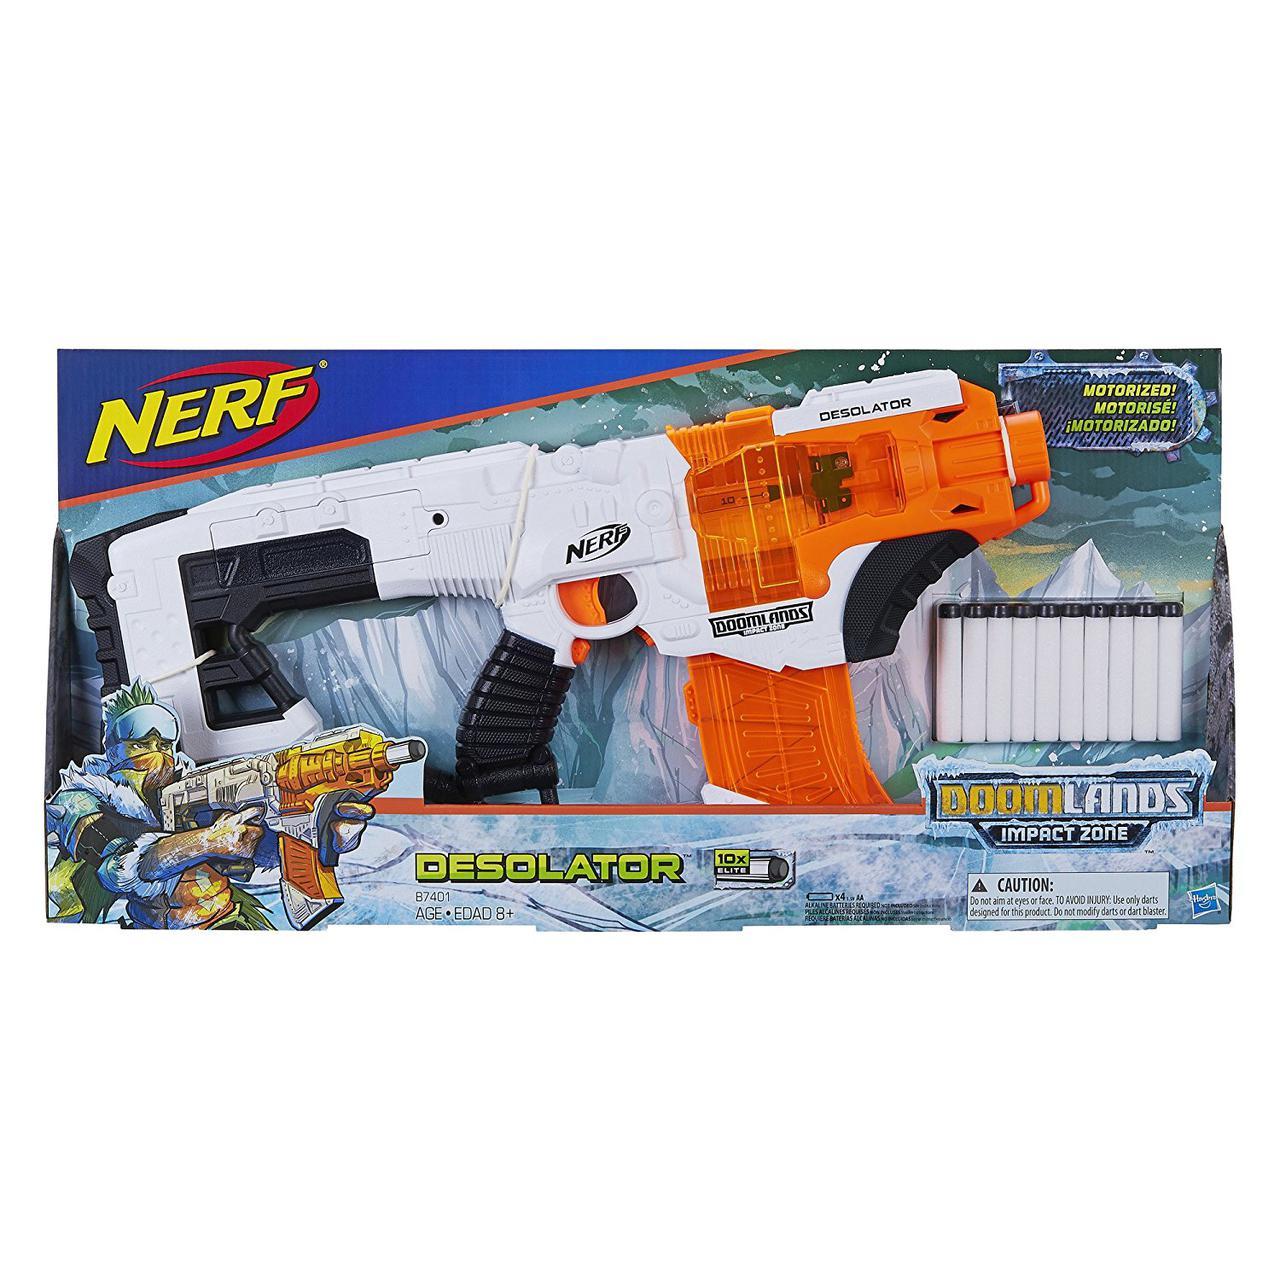 Бластер Nerf Думлэндс Опустошитель Doomlands Impact Zone DesolatorNerf